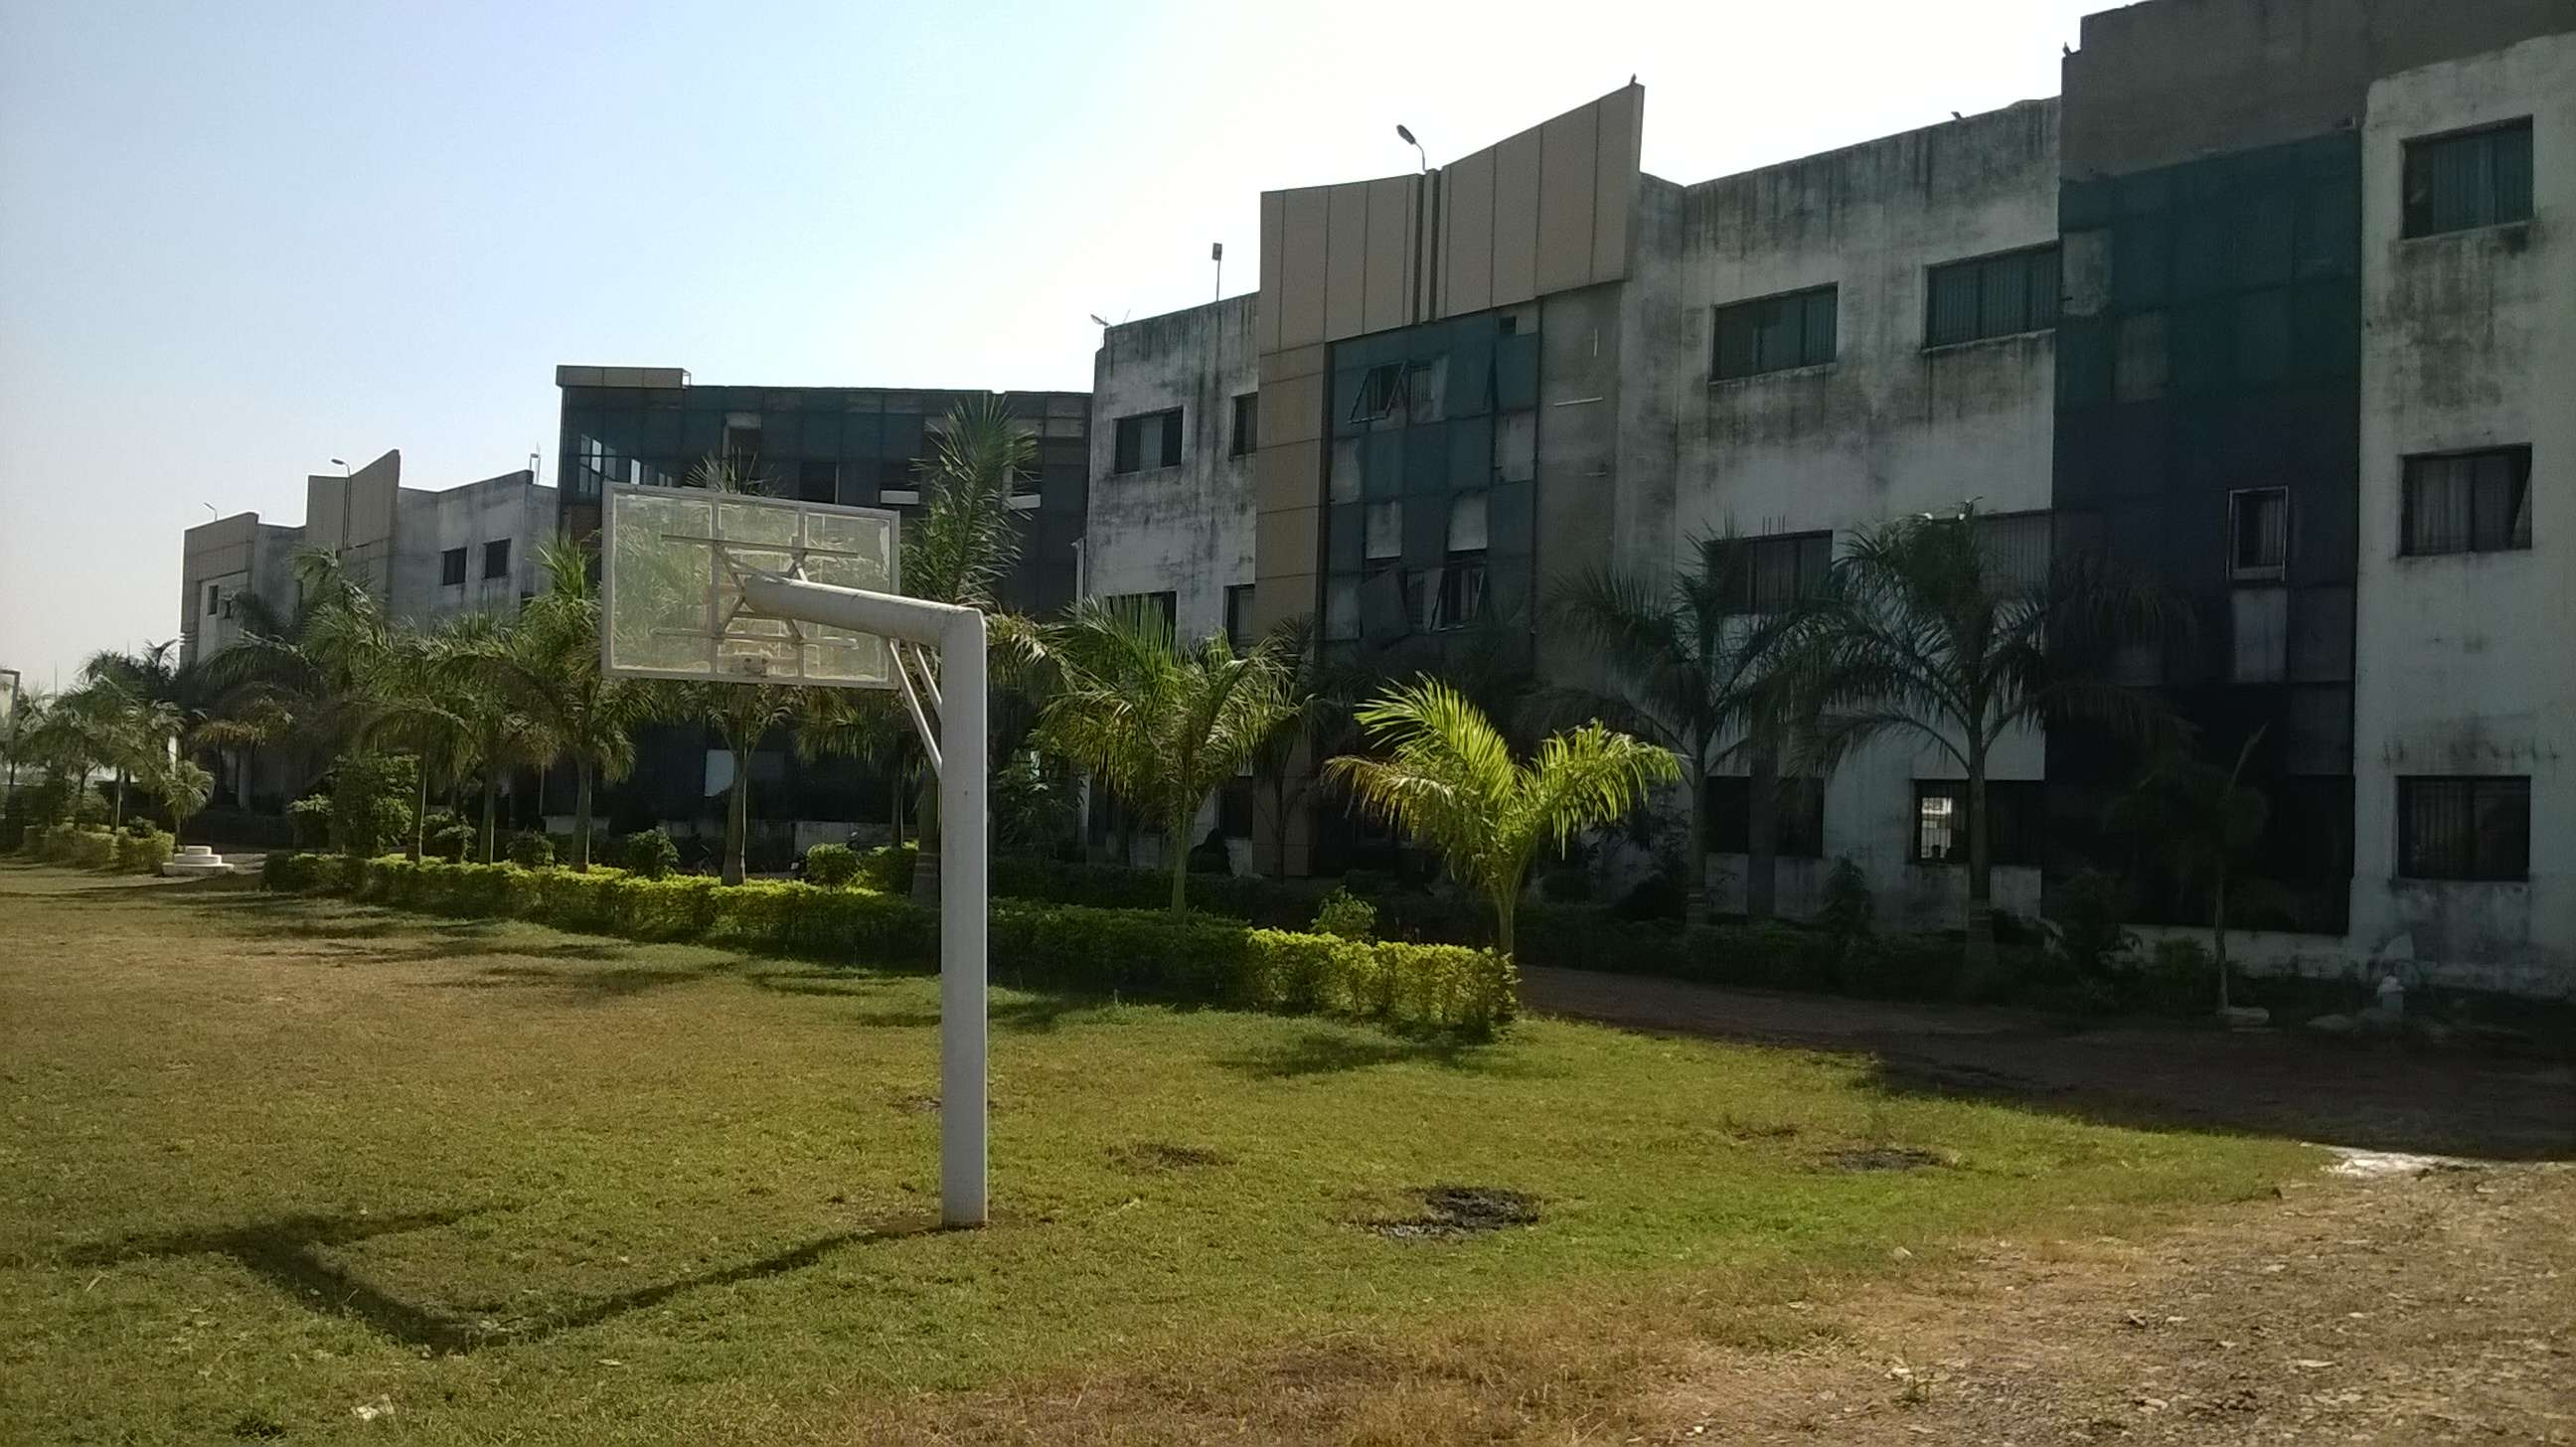 Delhi Public School Rewa Post and Villlage Attariya Tehsil Huzur 1030559